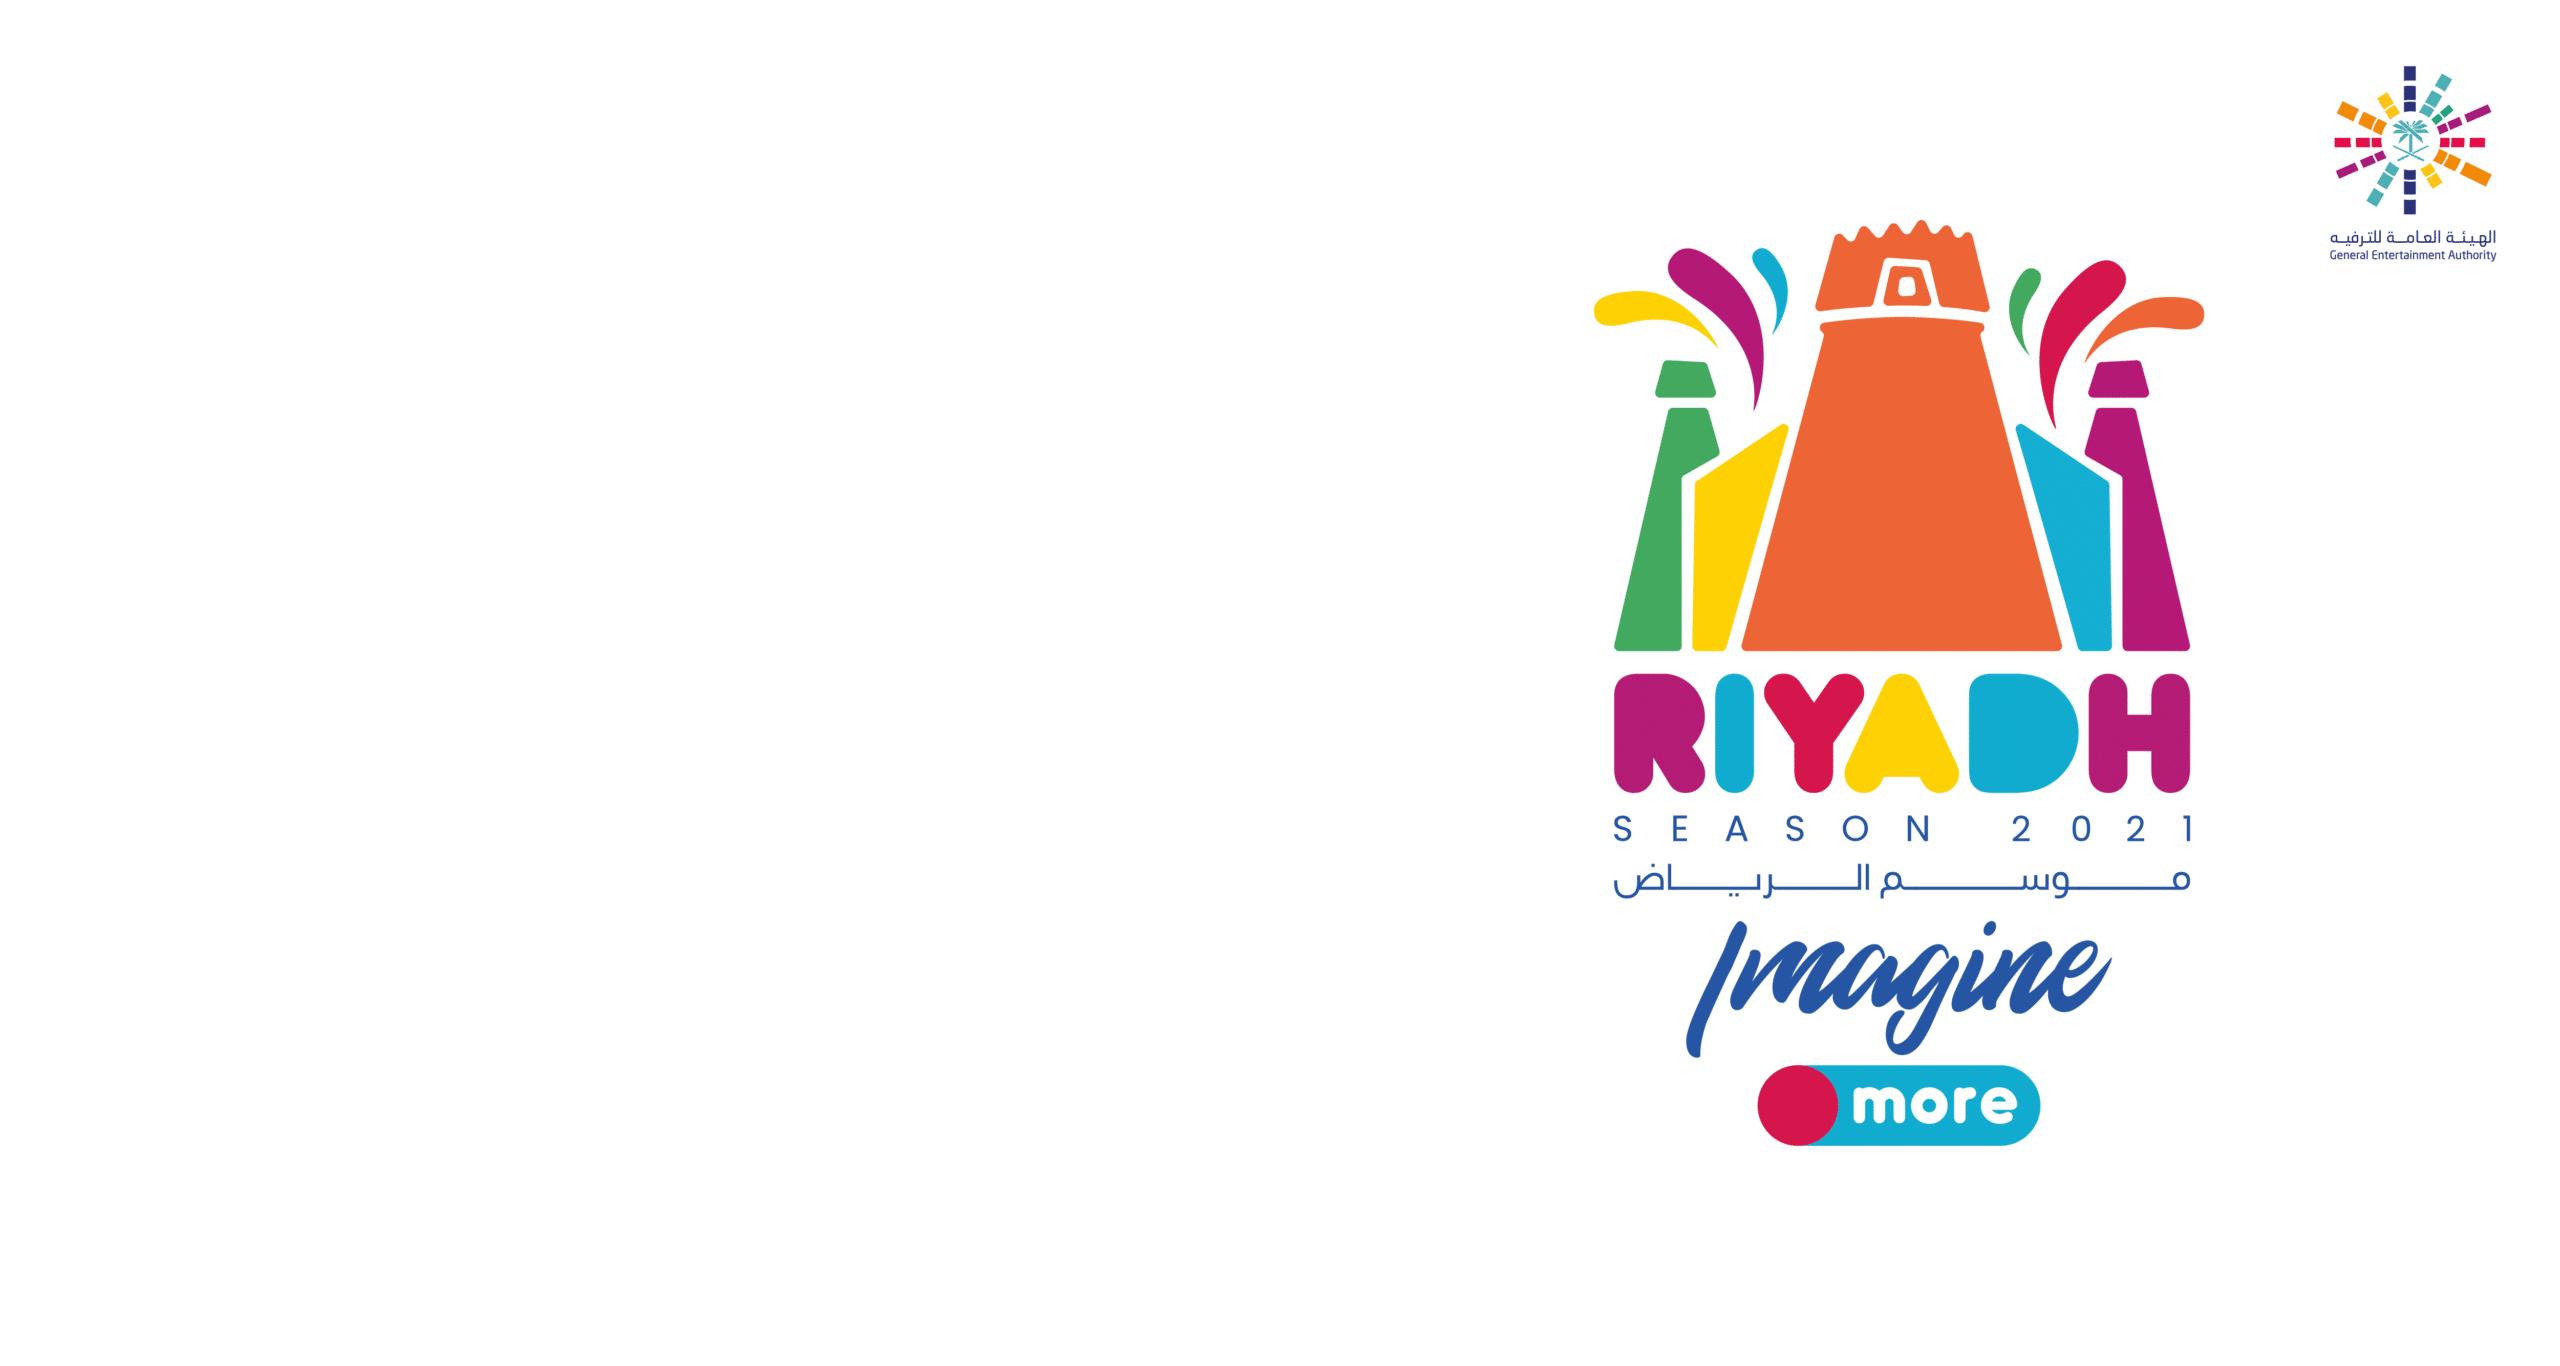 Turki Al Sheikh announces the launch of Riyadh Season on the 20th of October